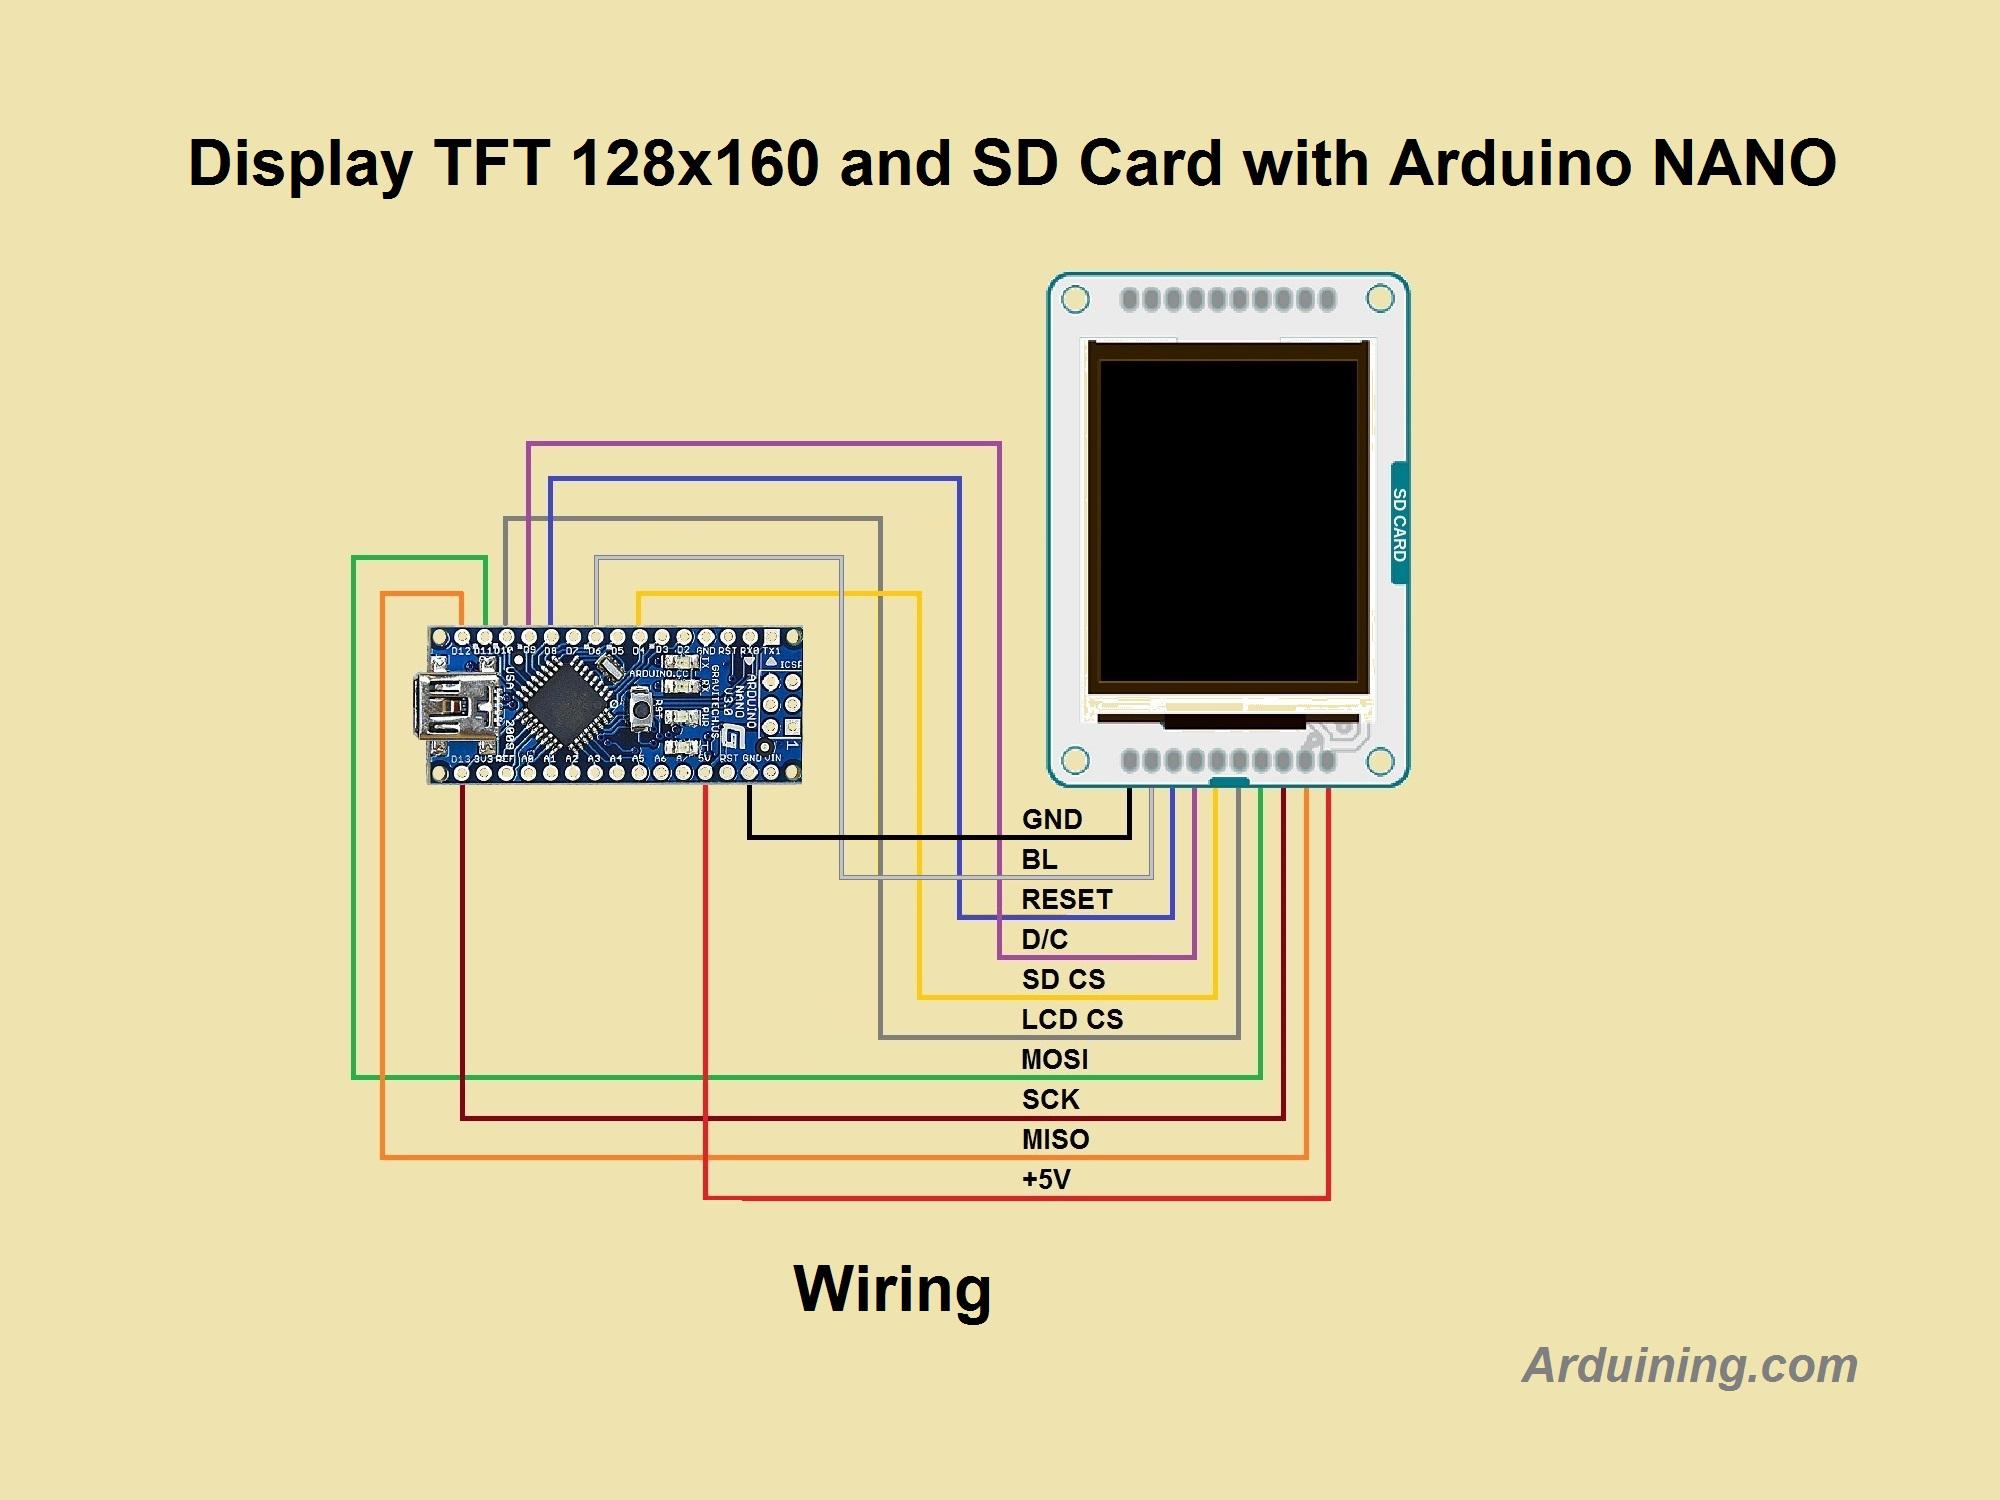 tft_sd_nano_dim_wiring?w=400&h=200&crop=1 ardunaut arduining  at reclaimingppi.co